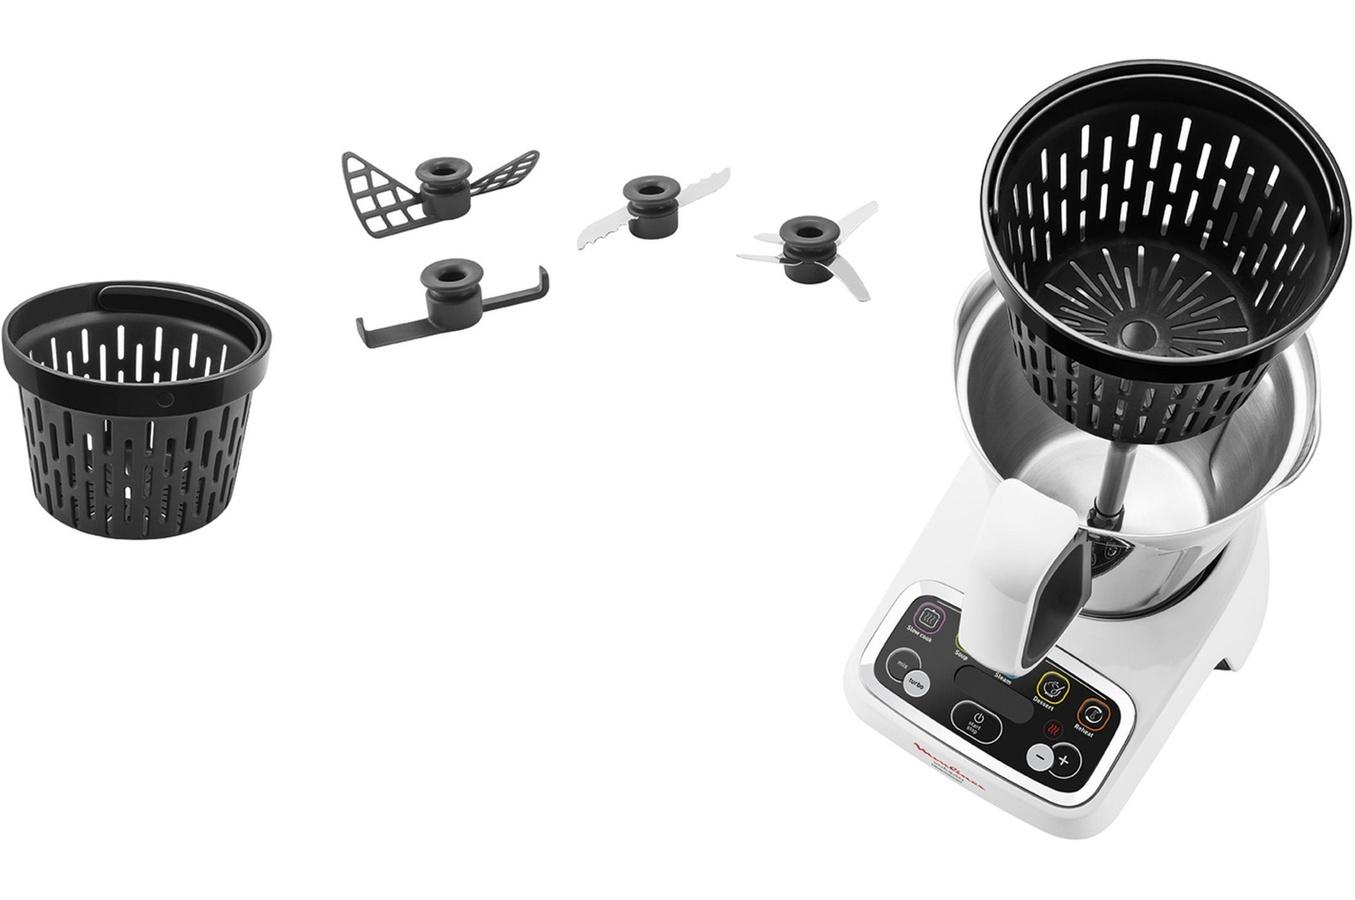 Moulinex robot cuiseur volupta hf404110 achat robot multifonction - Robot cuiseur volupta moulinex avis ...